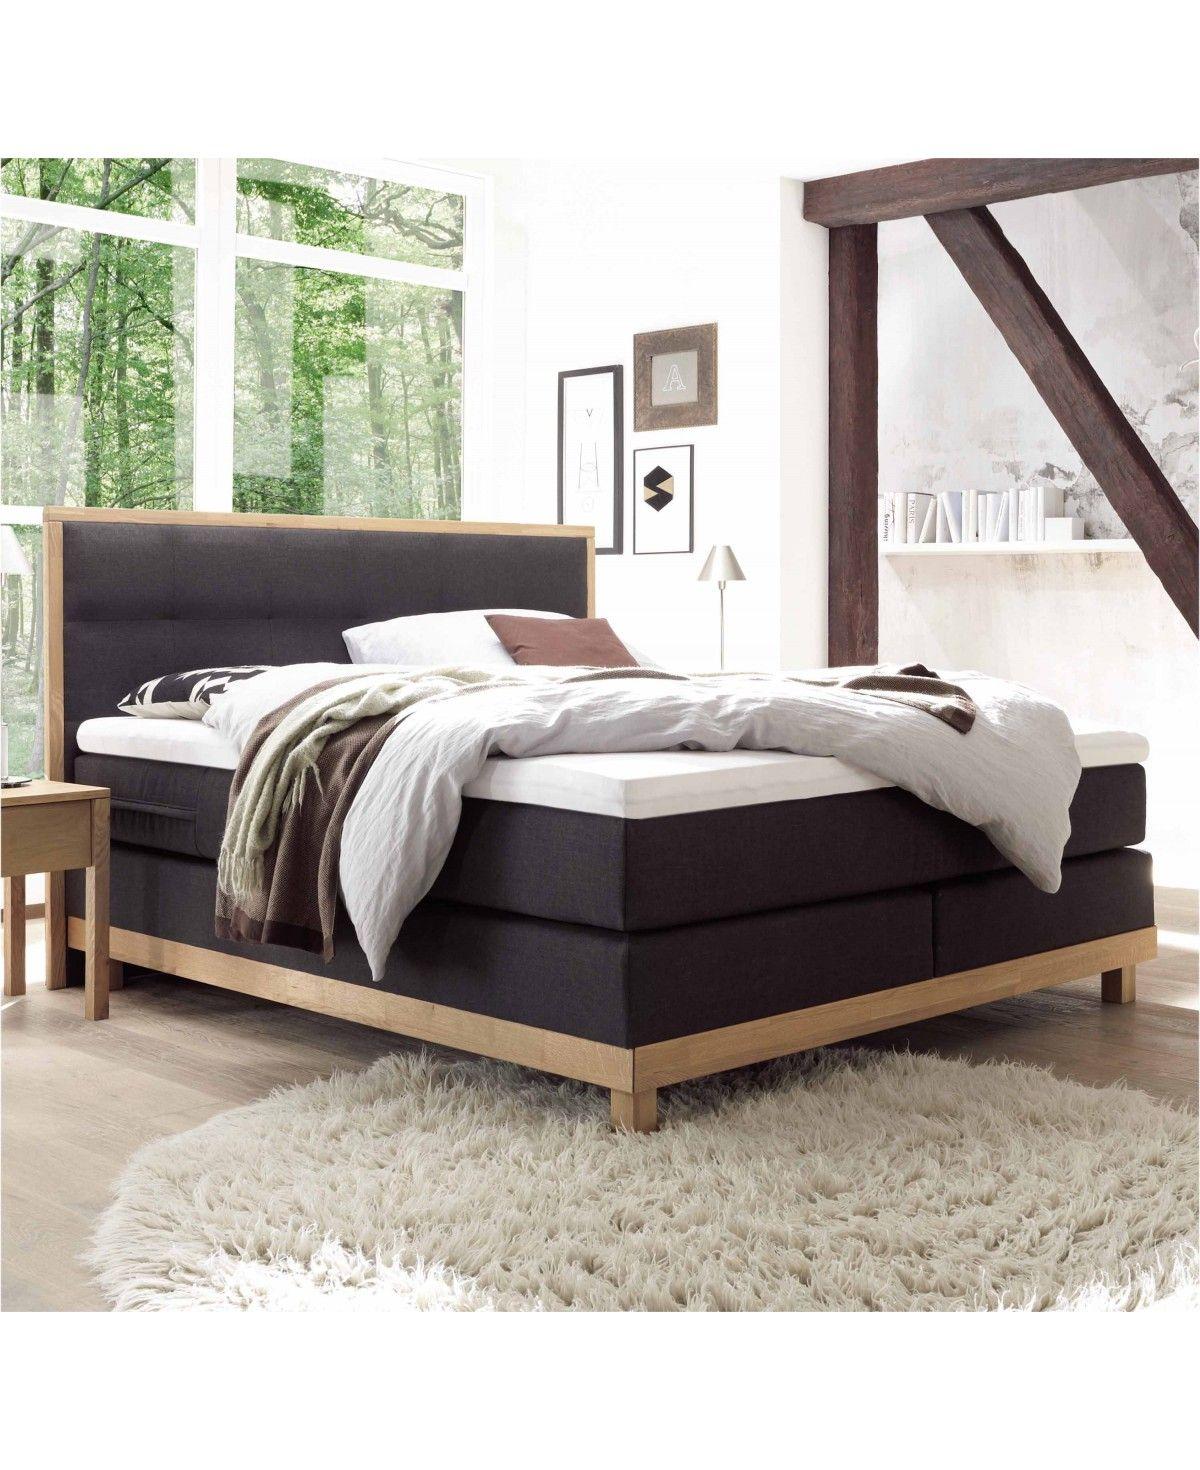 Liegekomfort: Soft Hasena Boxspringbett Bella Eiche Bianco|Kunstleder braun 160x200 Topper Superio